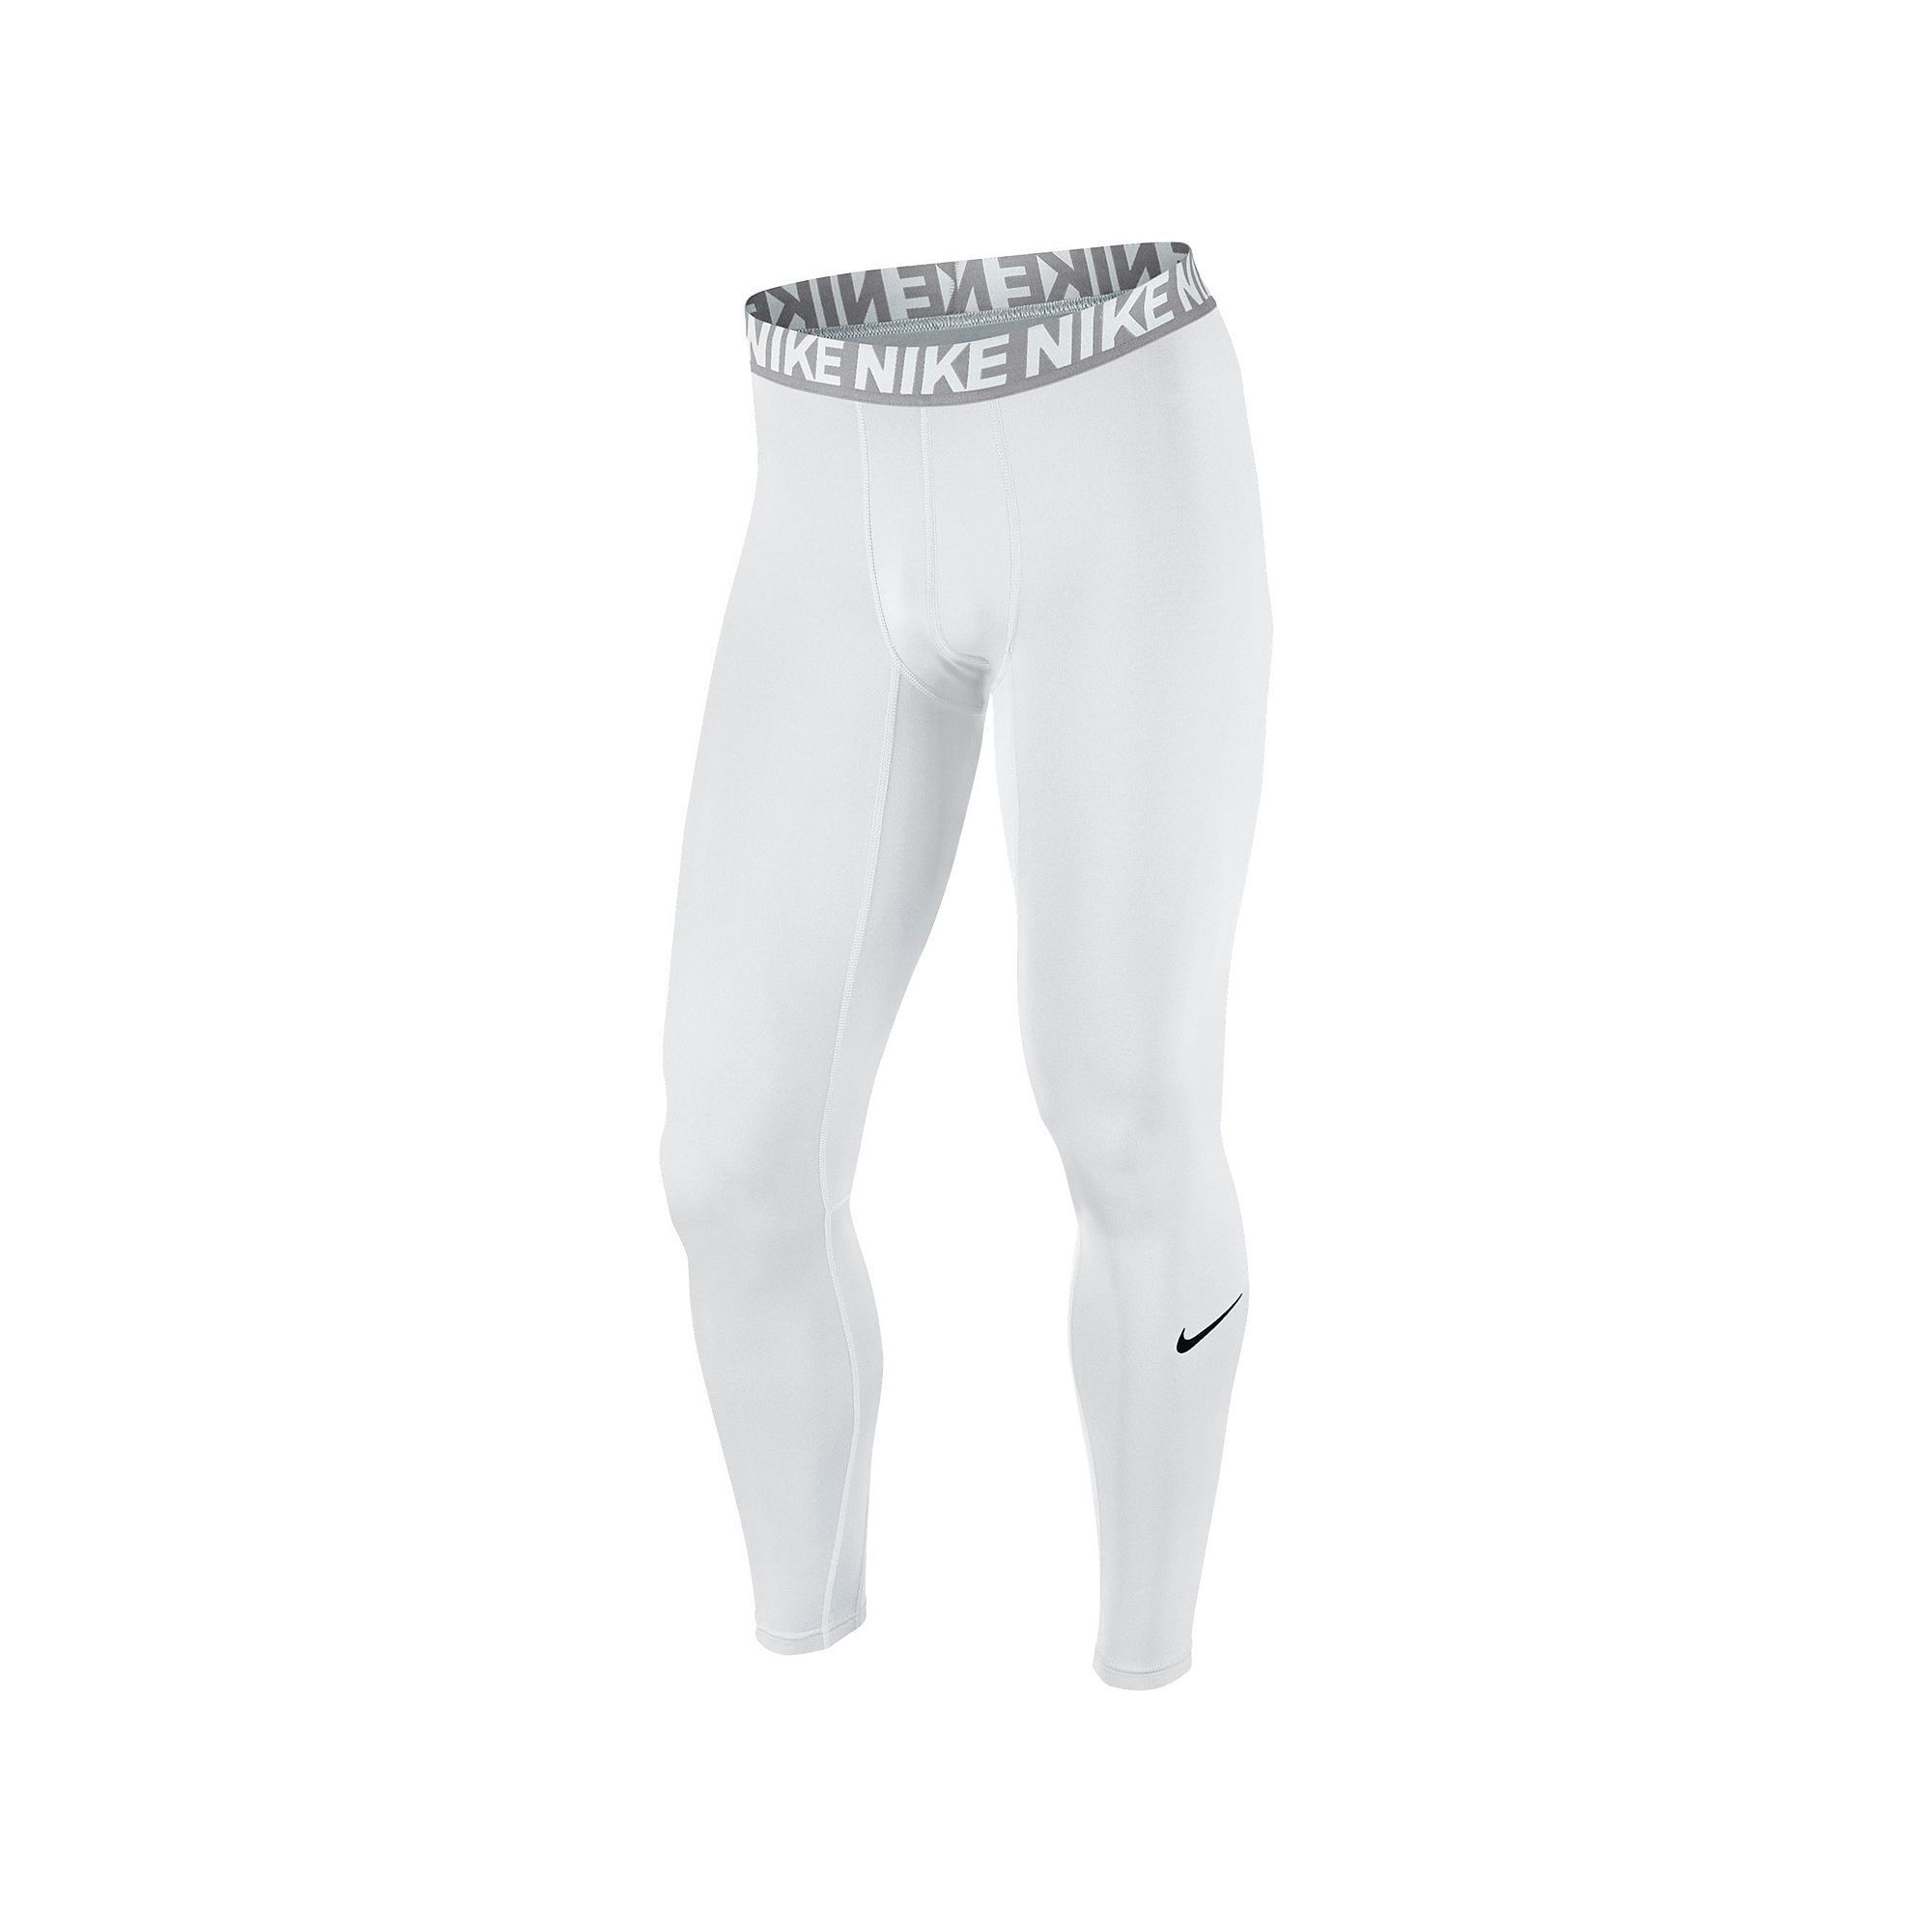 6fce89493b Men's Nike Dri-FIT Base Layer Compression Cool Tights, Size: Medium, White